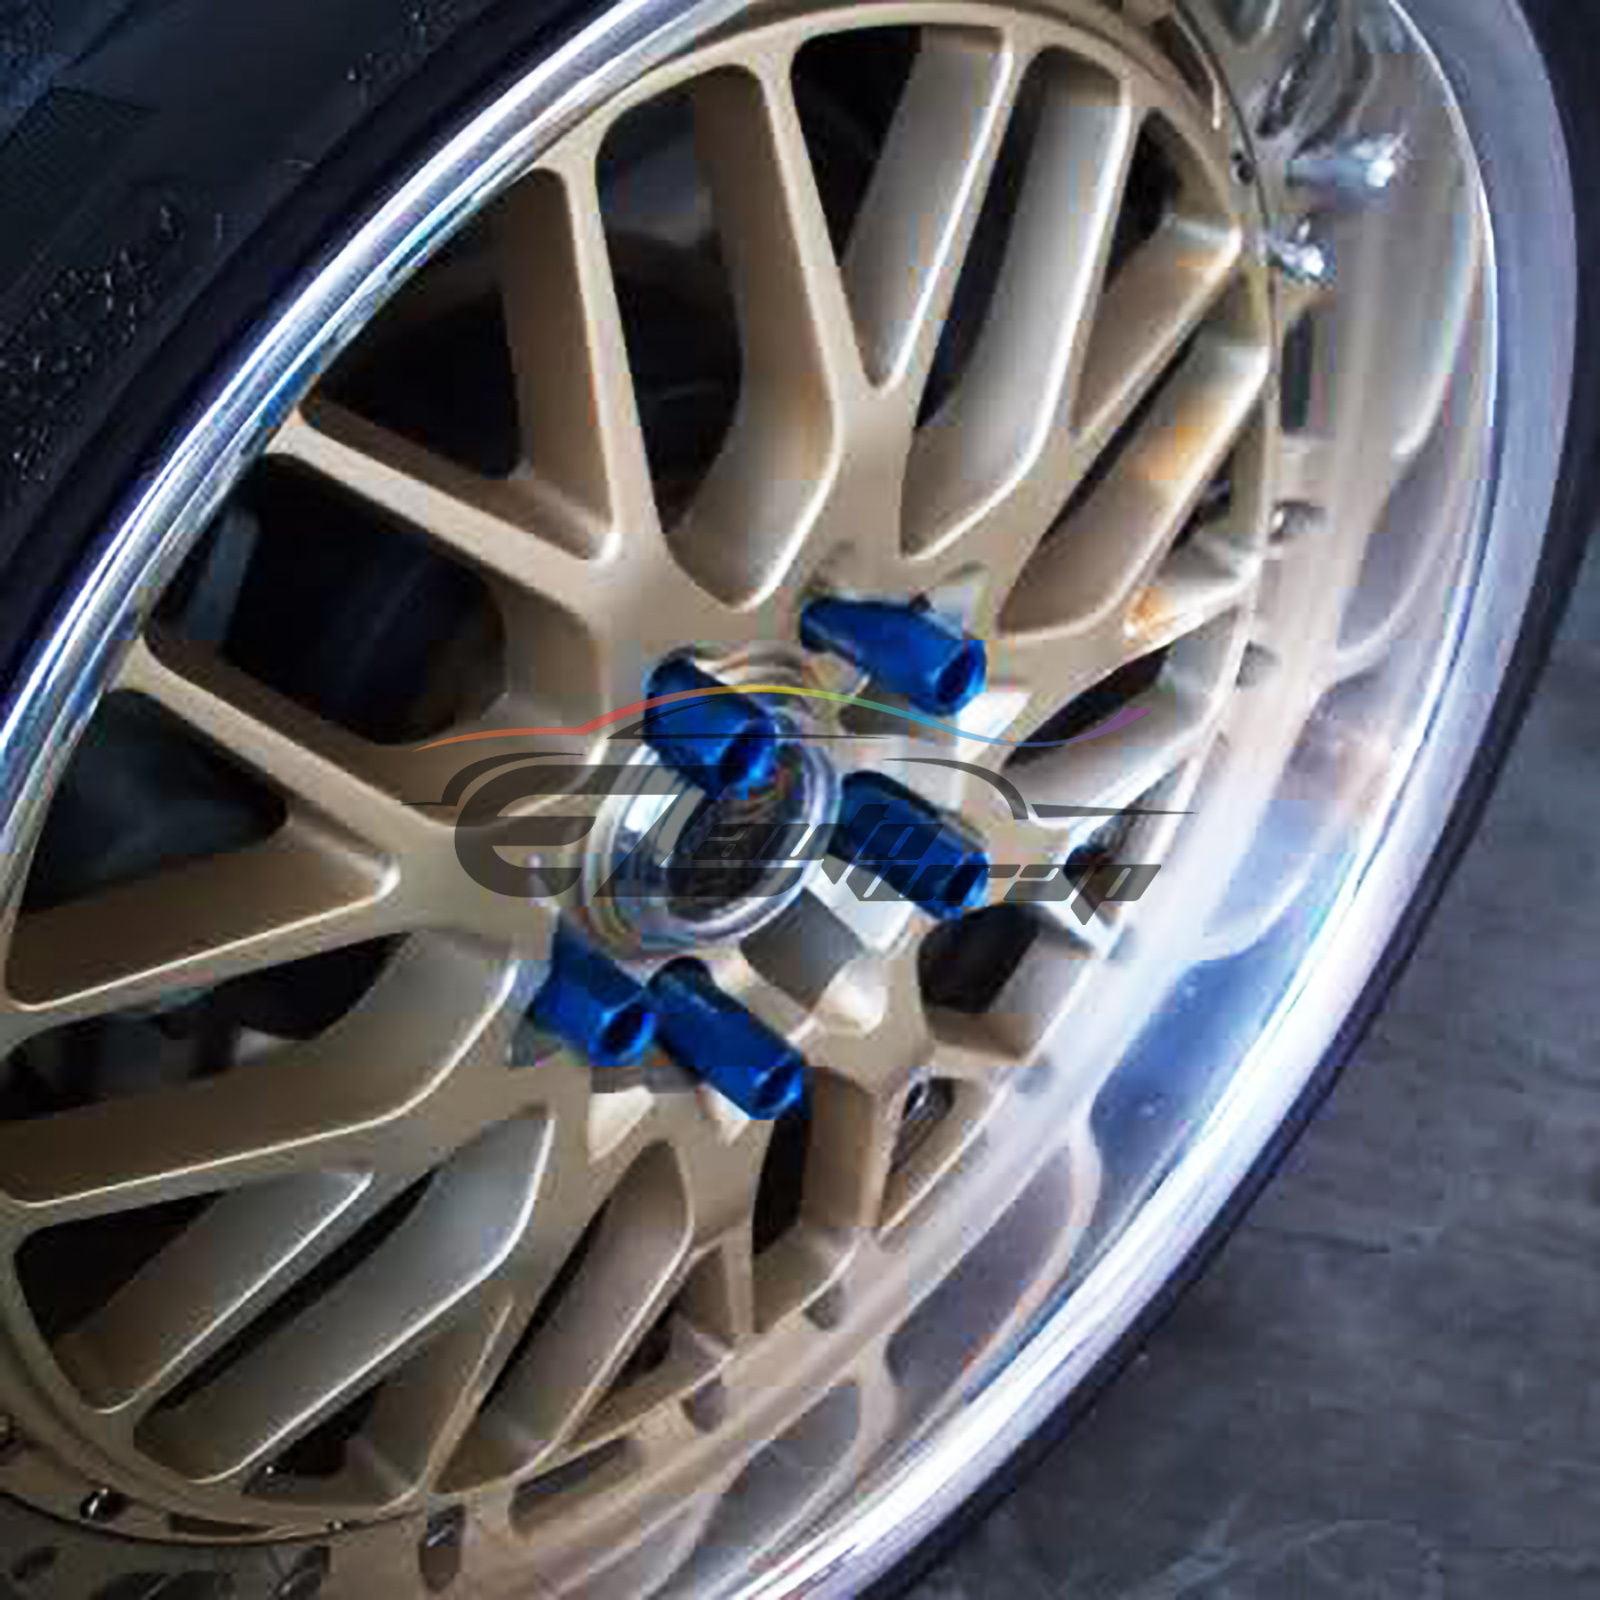 EzAuto Wrap Neo Chrome 20 PCS M12x1.25 Lug Nuts Spiked 60mm Extended Tuner Aluminum Wheels Rims Cap WN03